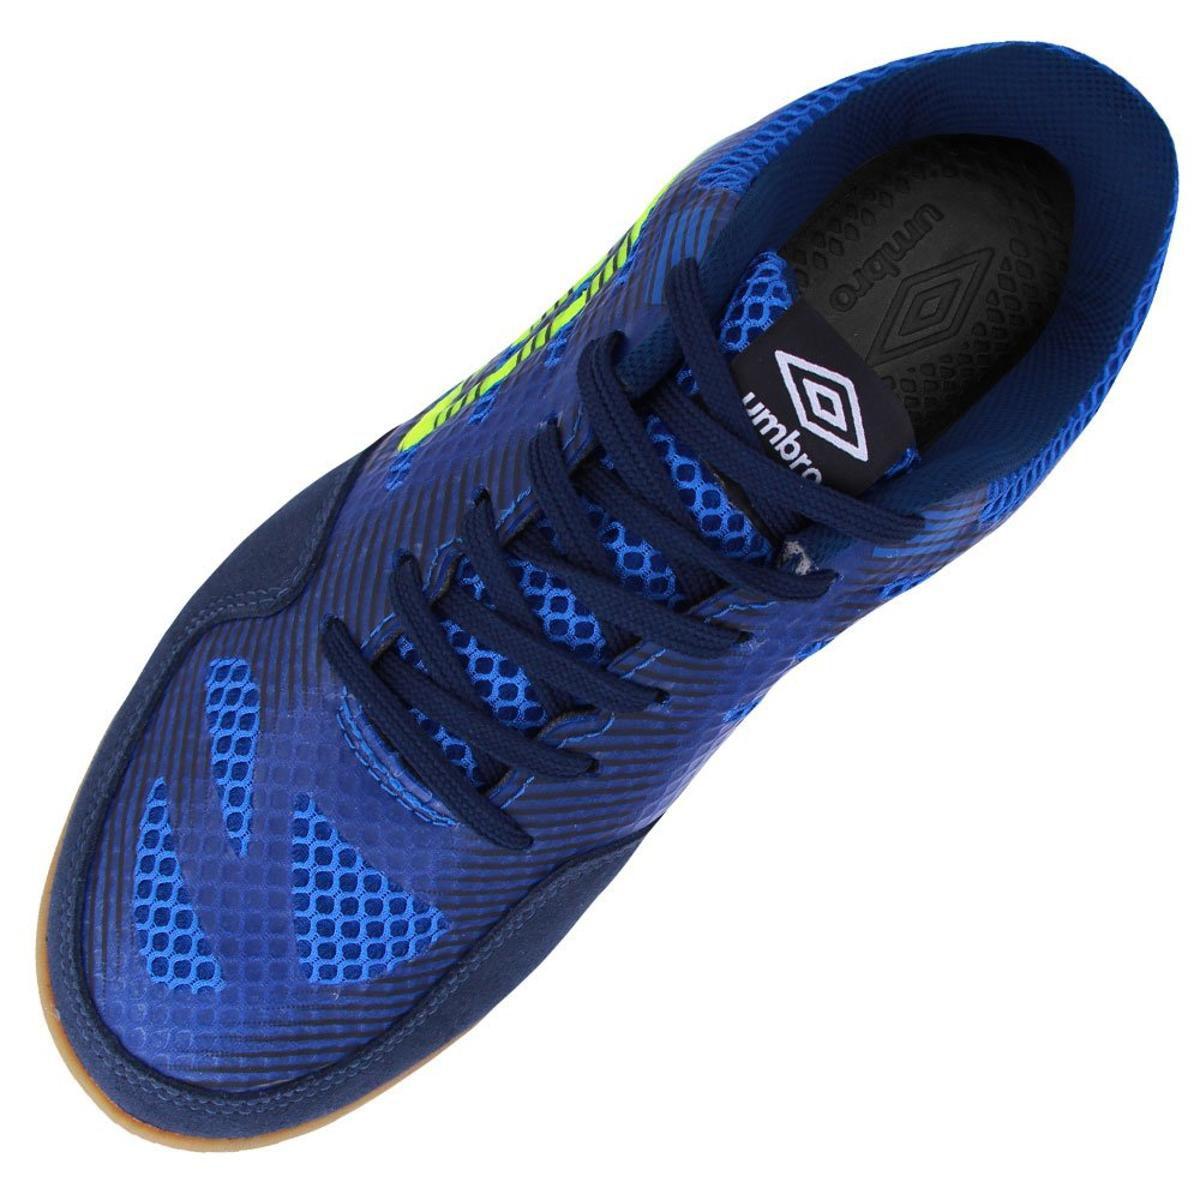 Chuteira Futsal Umbro Pró IV Adulto - Azul Marinho